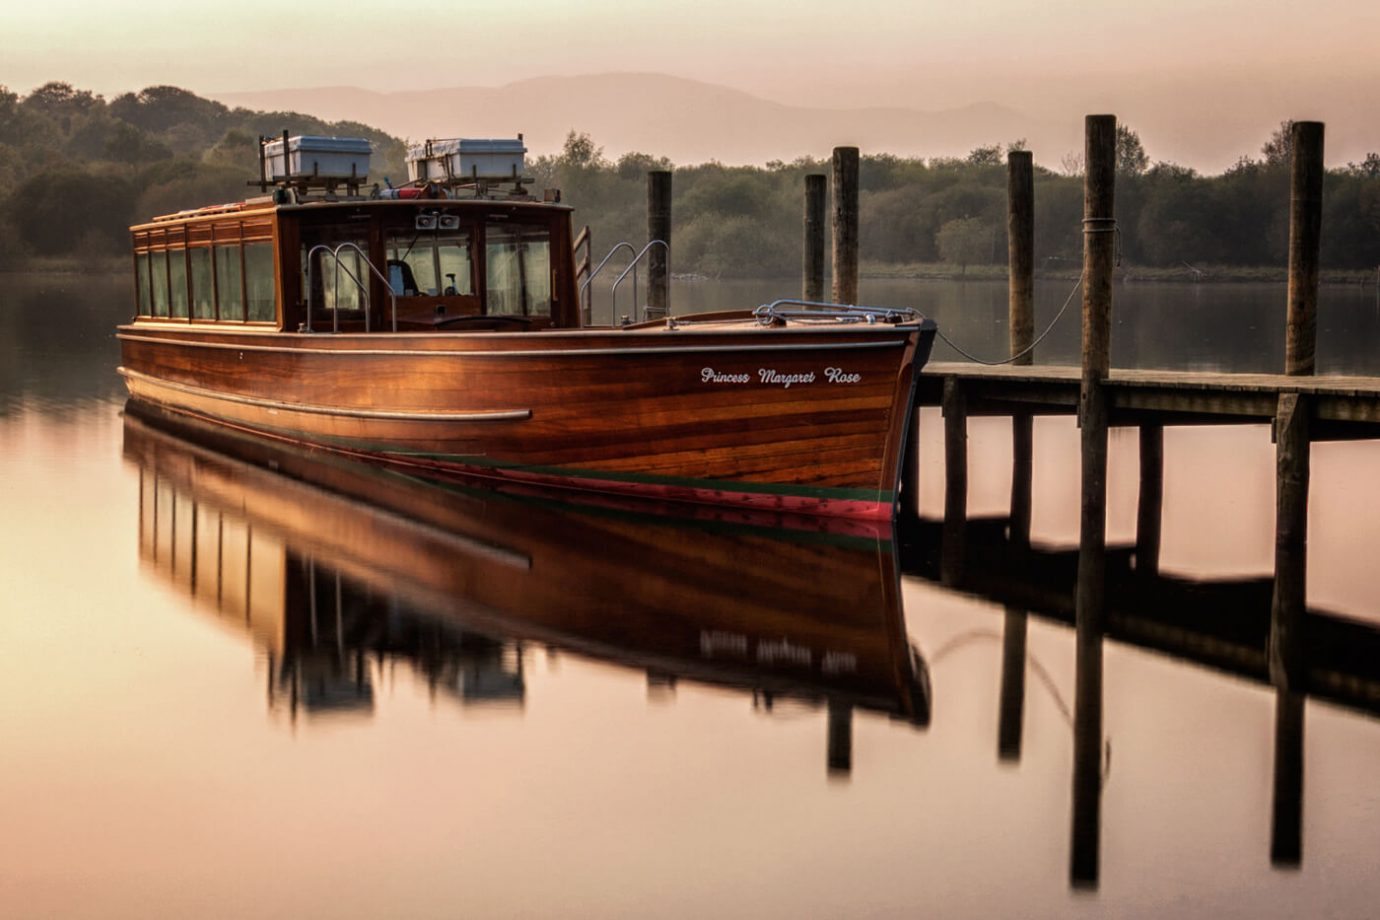 Boat, Derwentwater, Keswick, Lake District